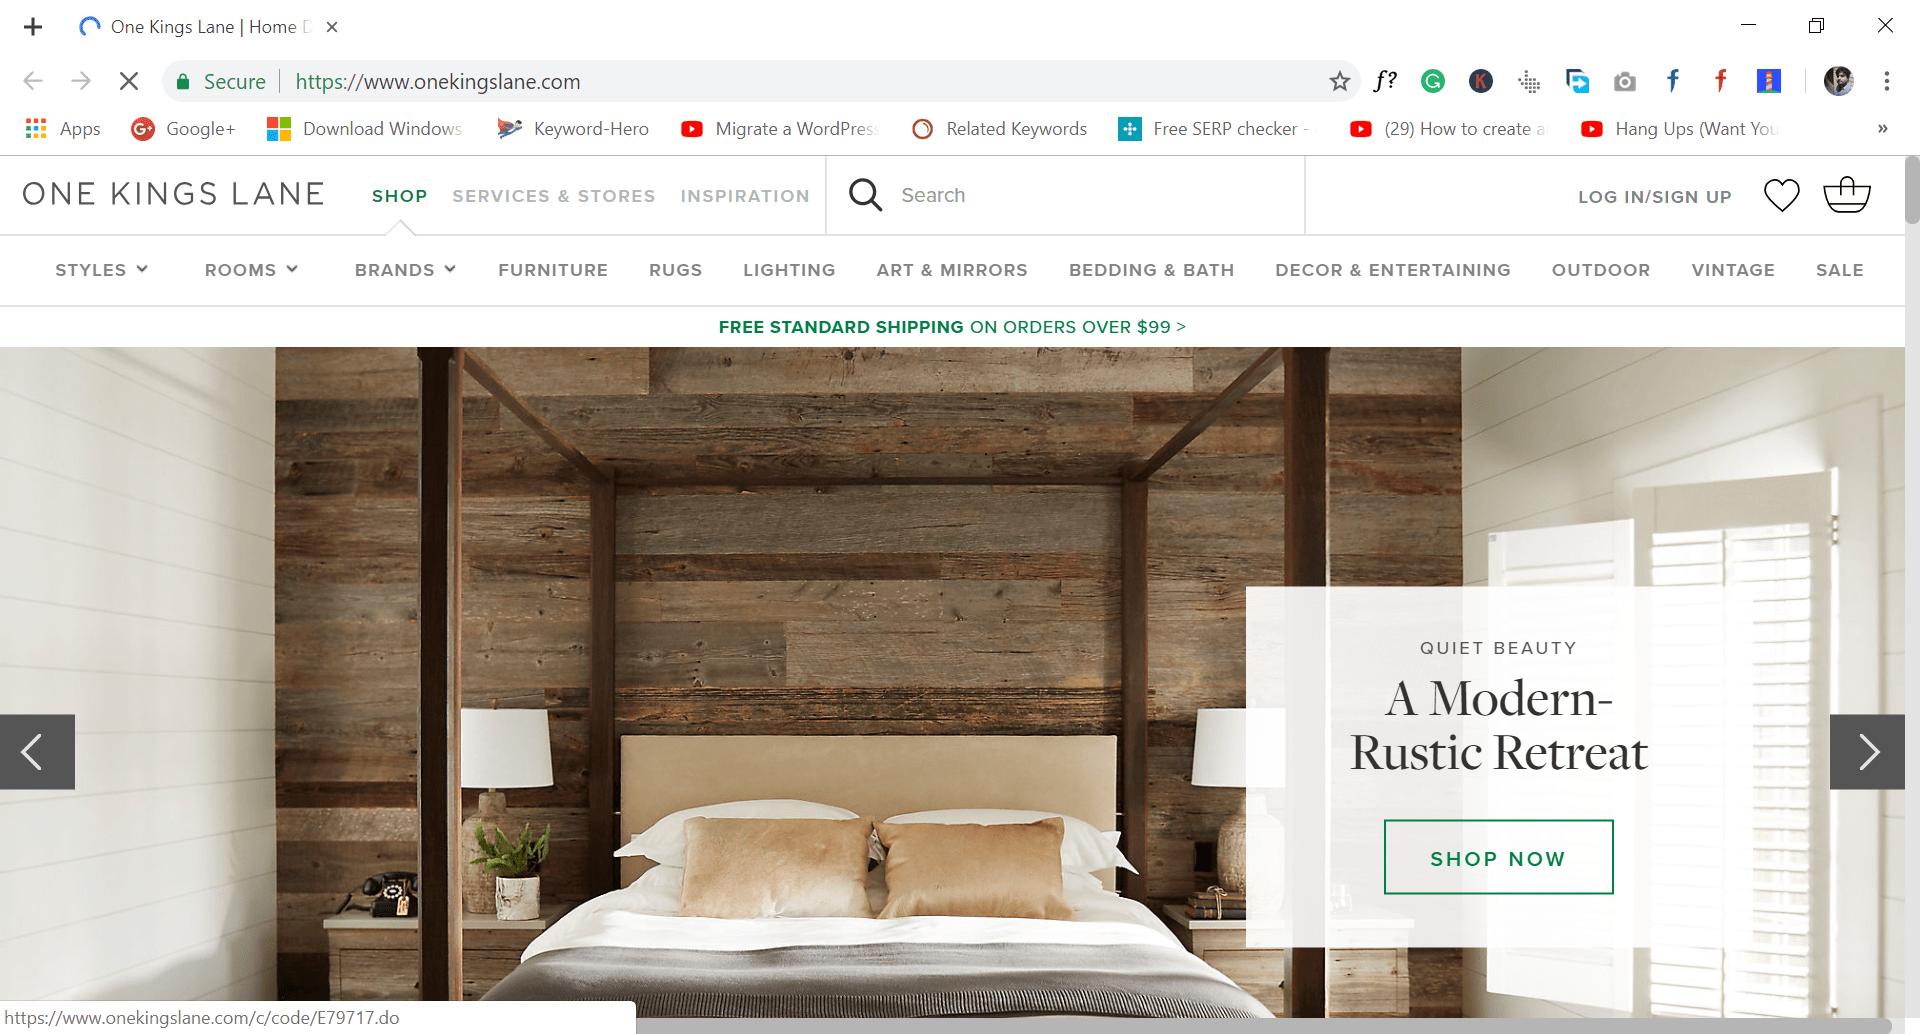 onekingslane - site like wish.com